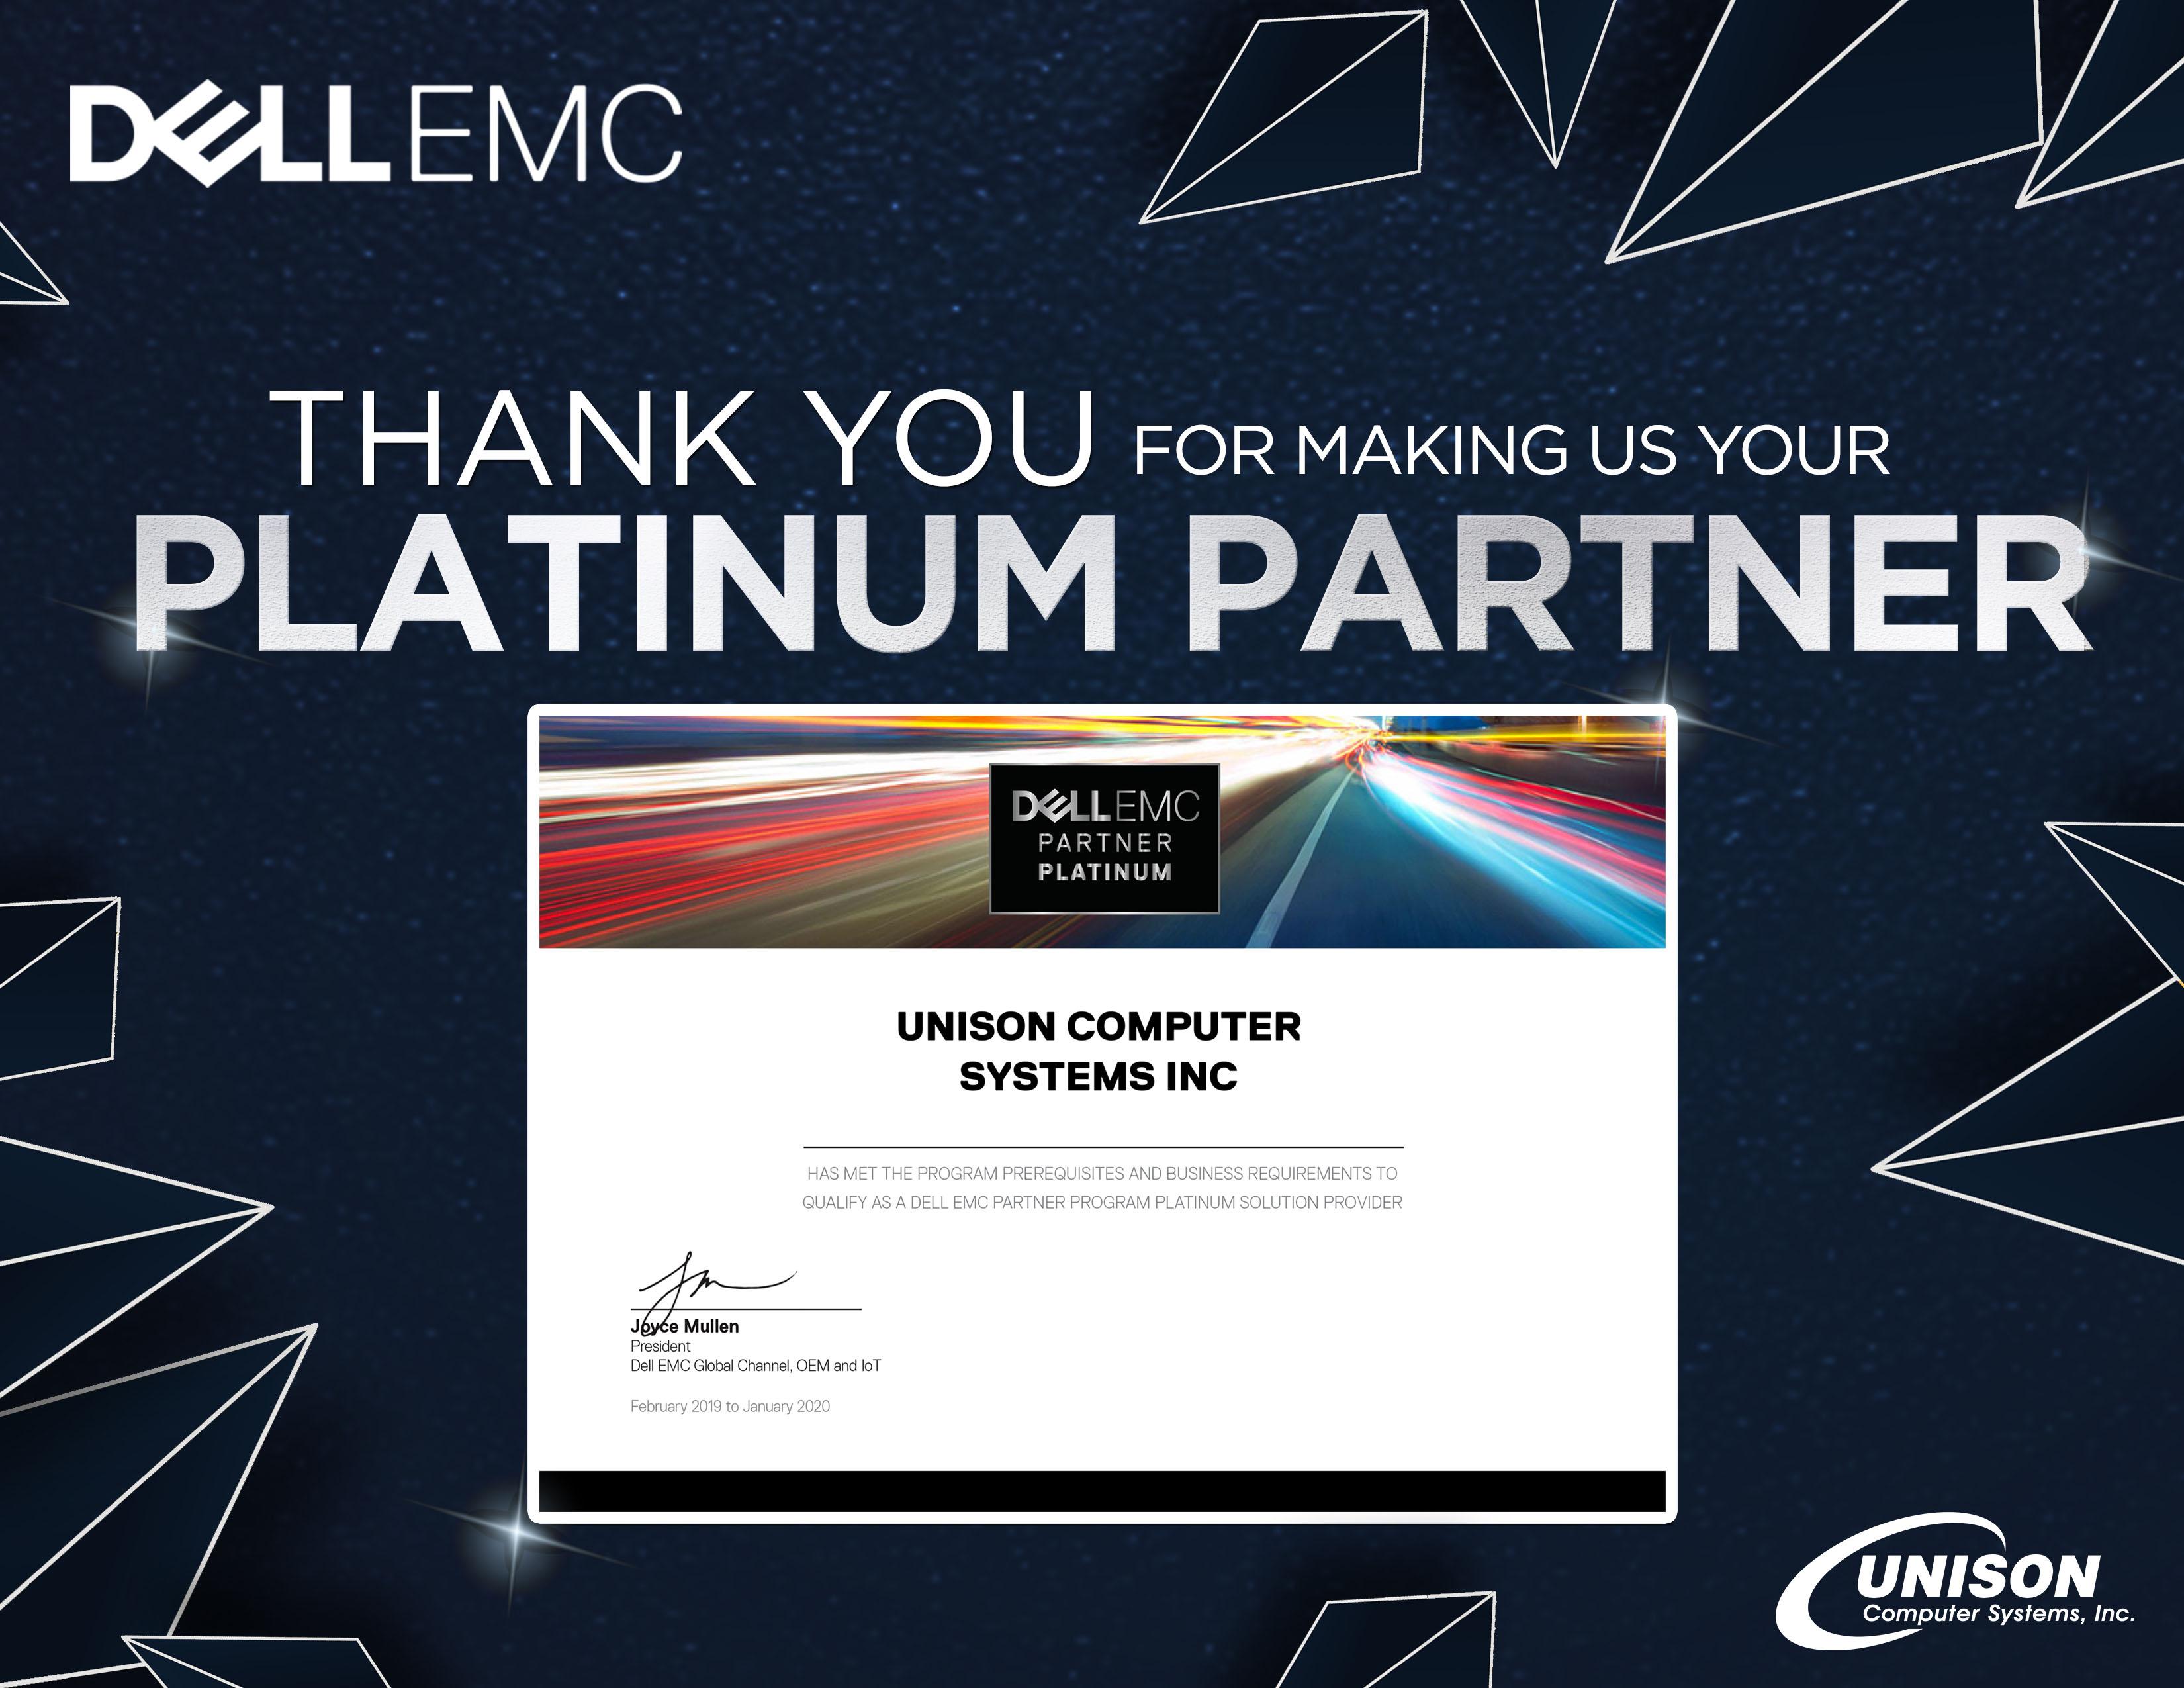 Unison | Computer Systems, Inc